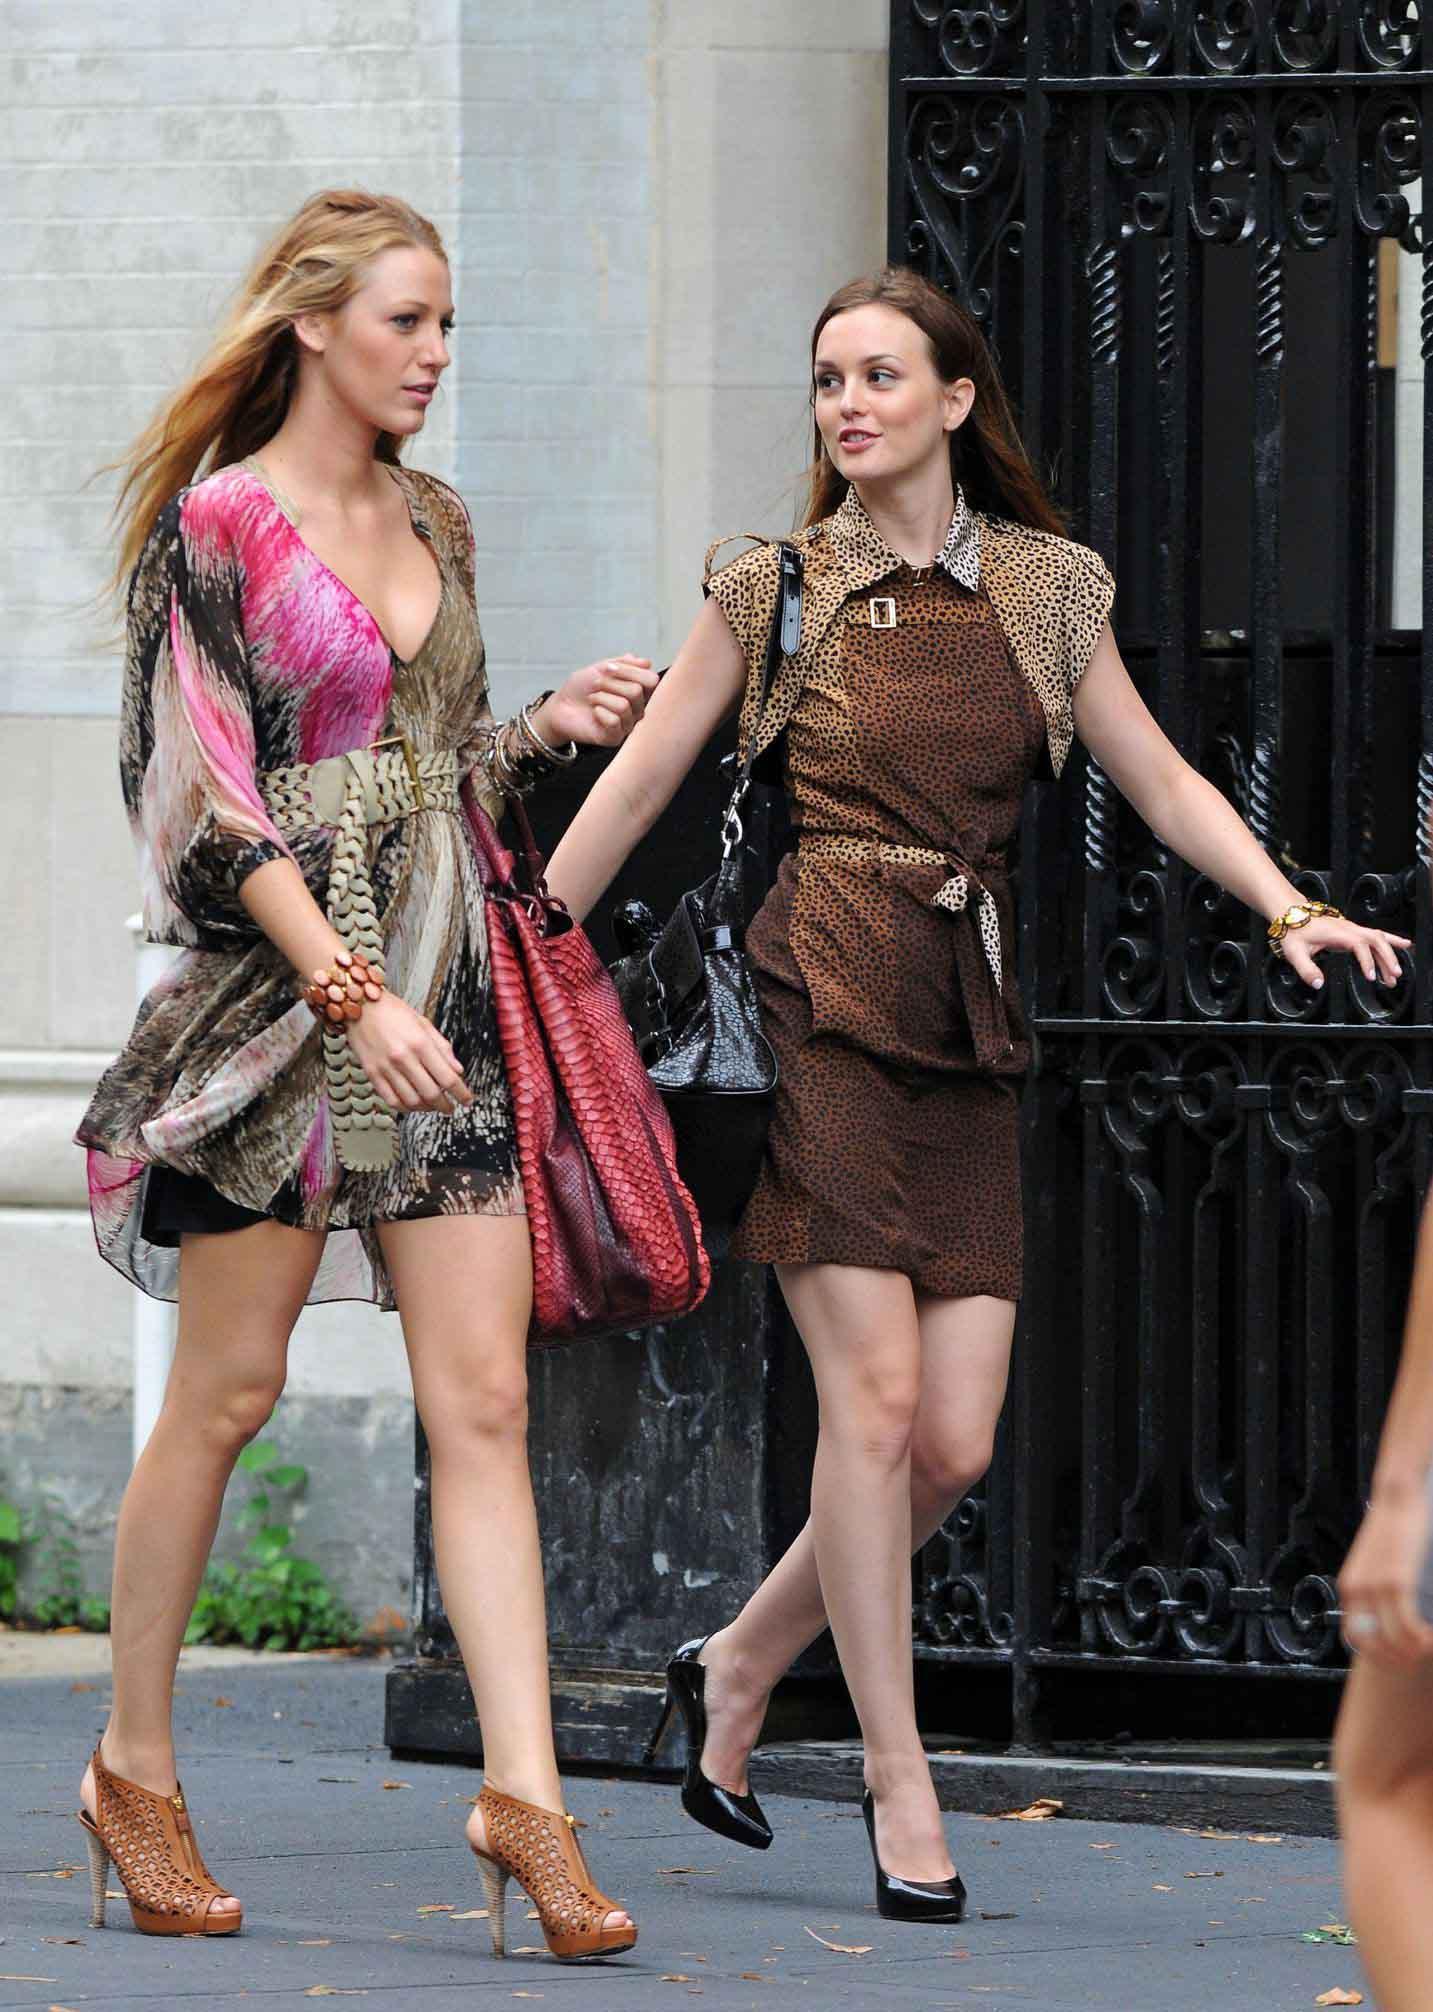 Gossip Girl - Tournage Saison 4. Serena · Chuck et Eva · Blair · Eva ·  Chuck et Eva · Serena et Serena ... a30417ed378